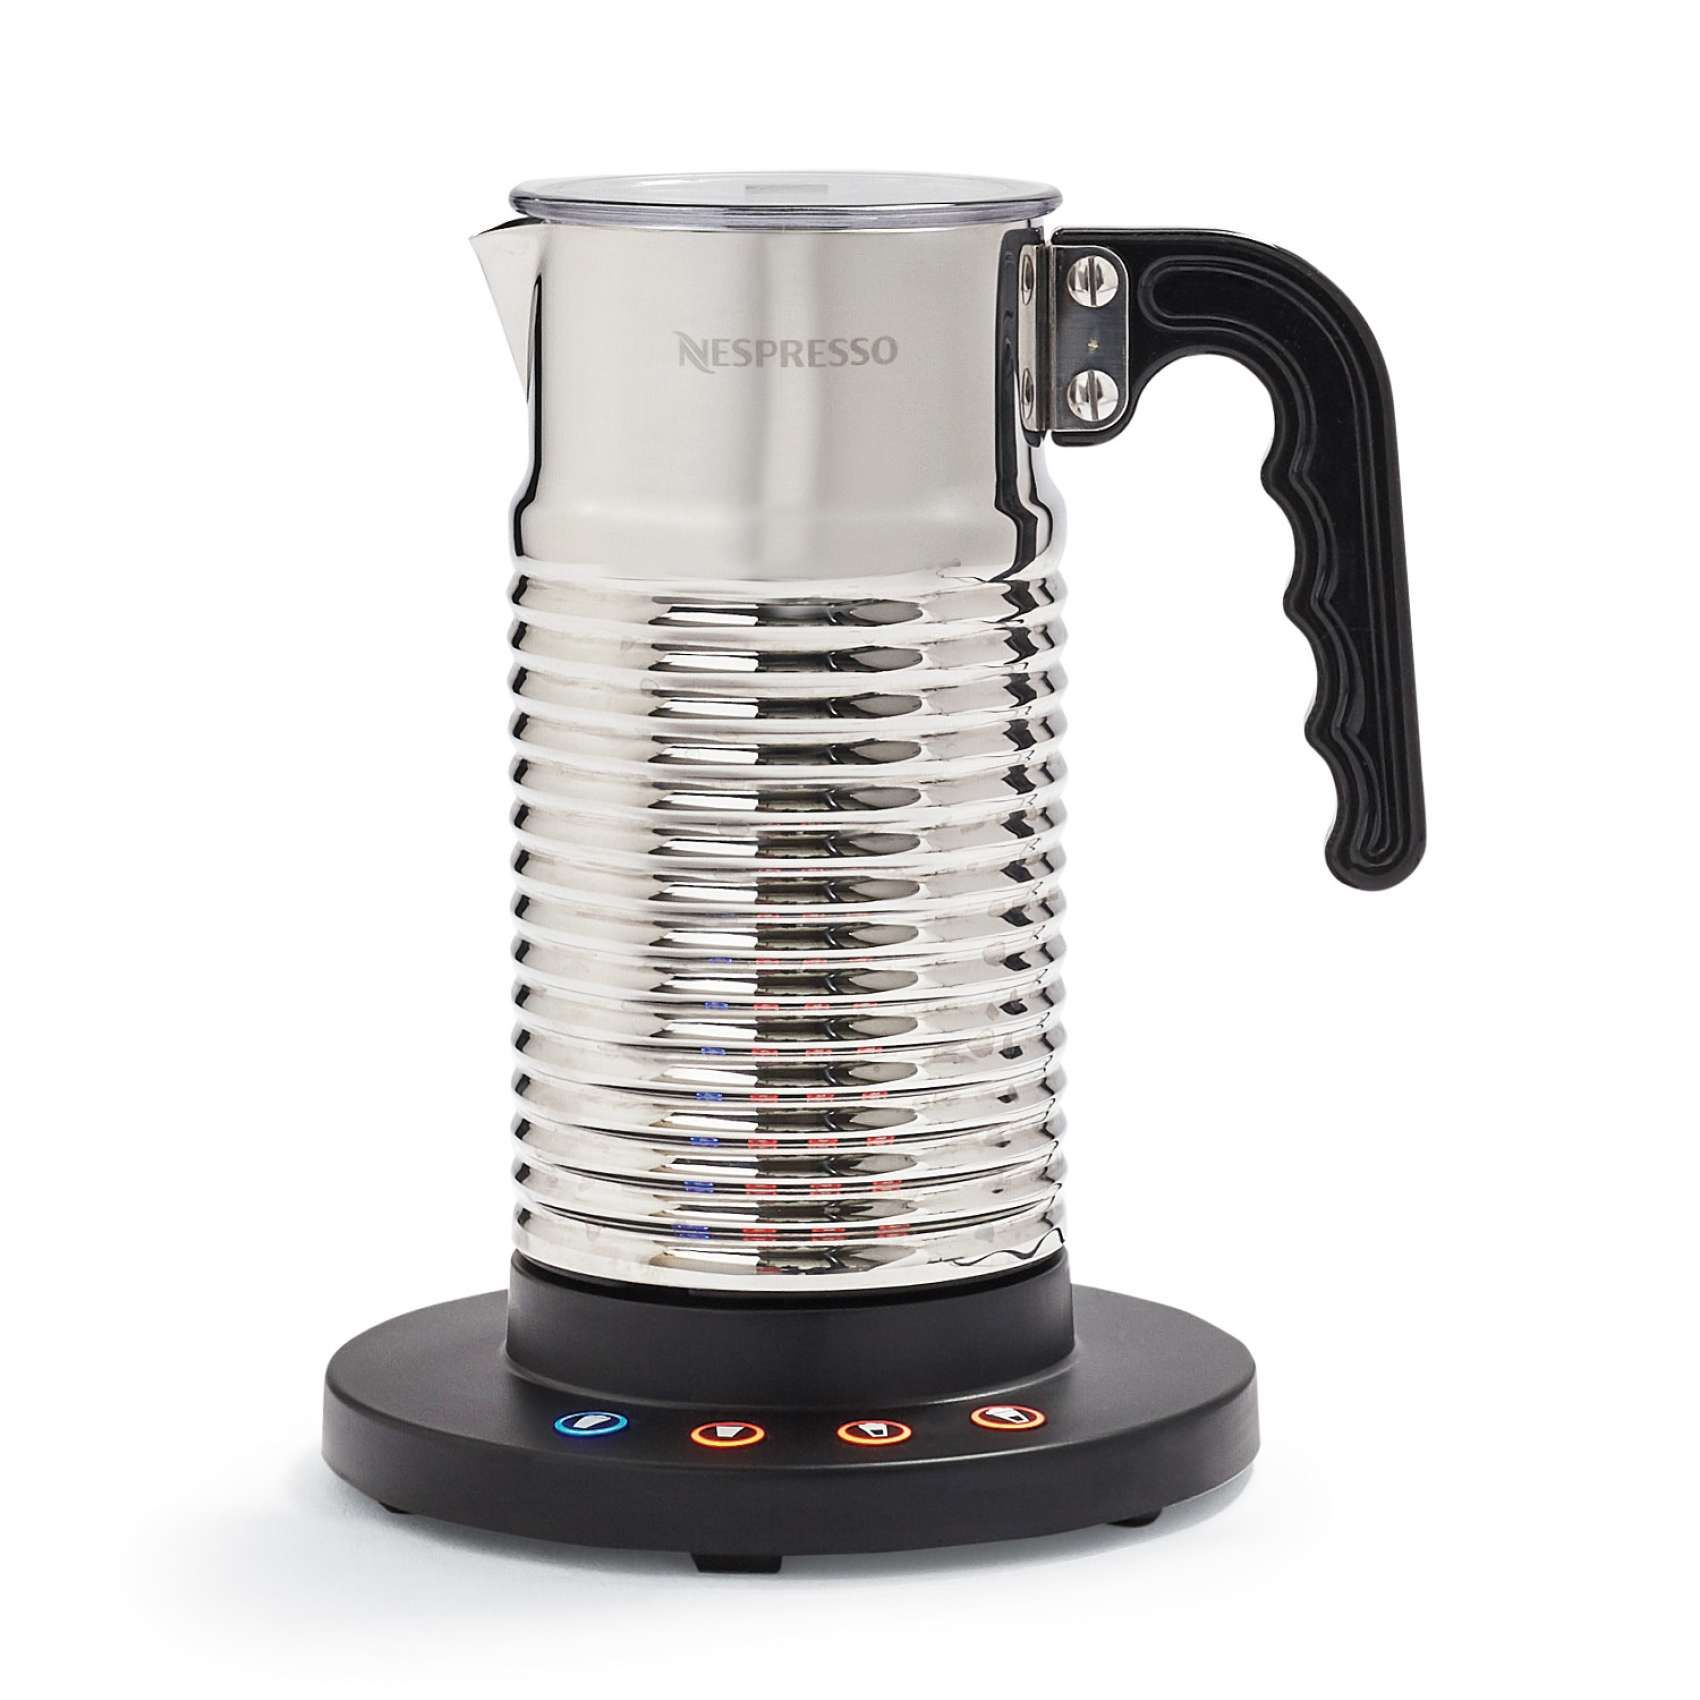 Nespresso aeroccino 4 milk frother coffee drink recipes